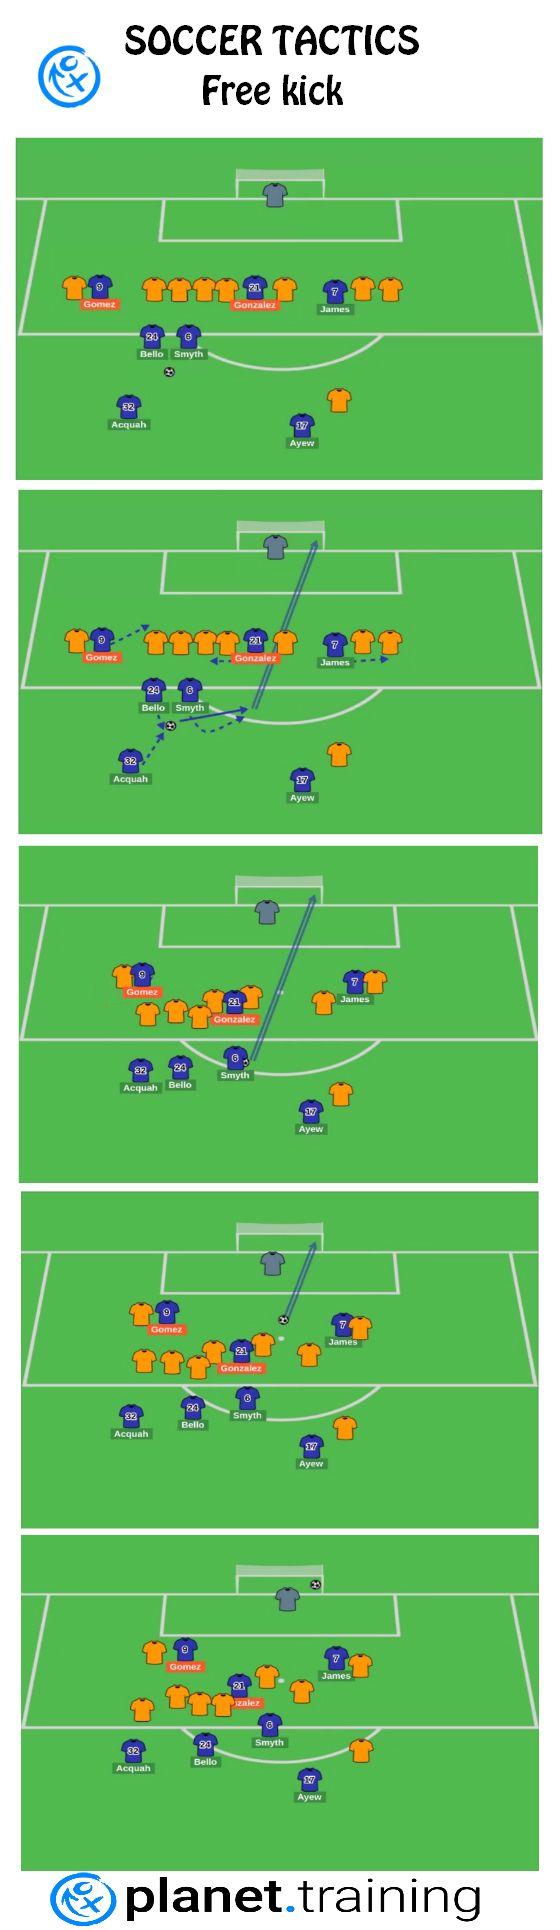 soccer / football exercises & tactics & drills for coaching